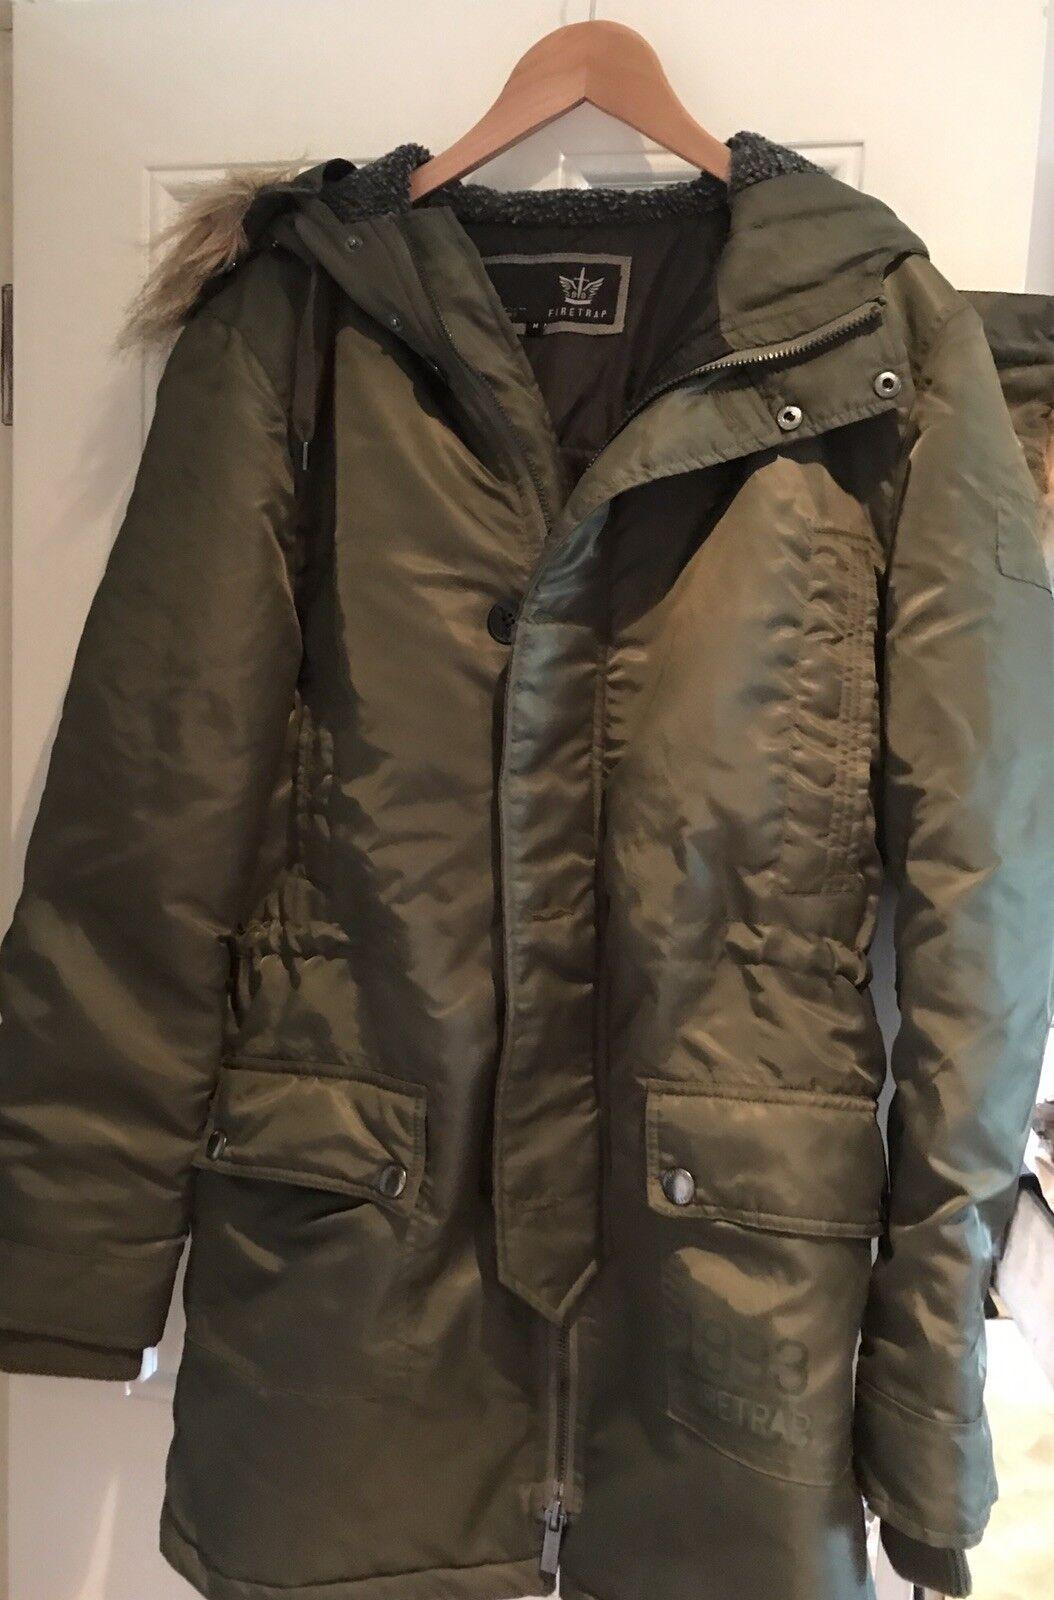 Firetrap Parka style Coat - Green - M - BNW